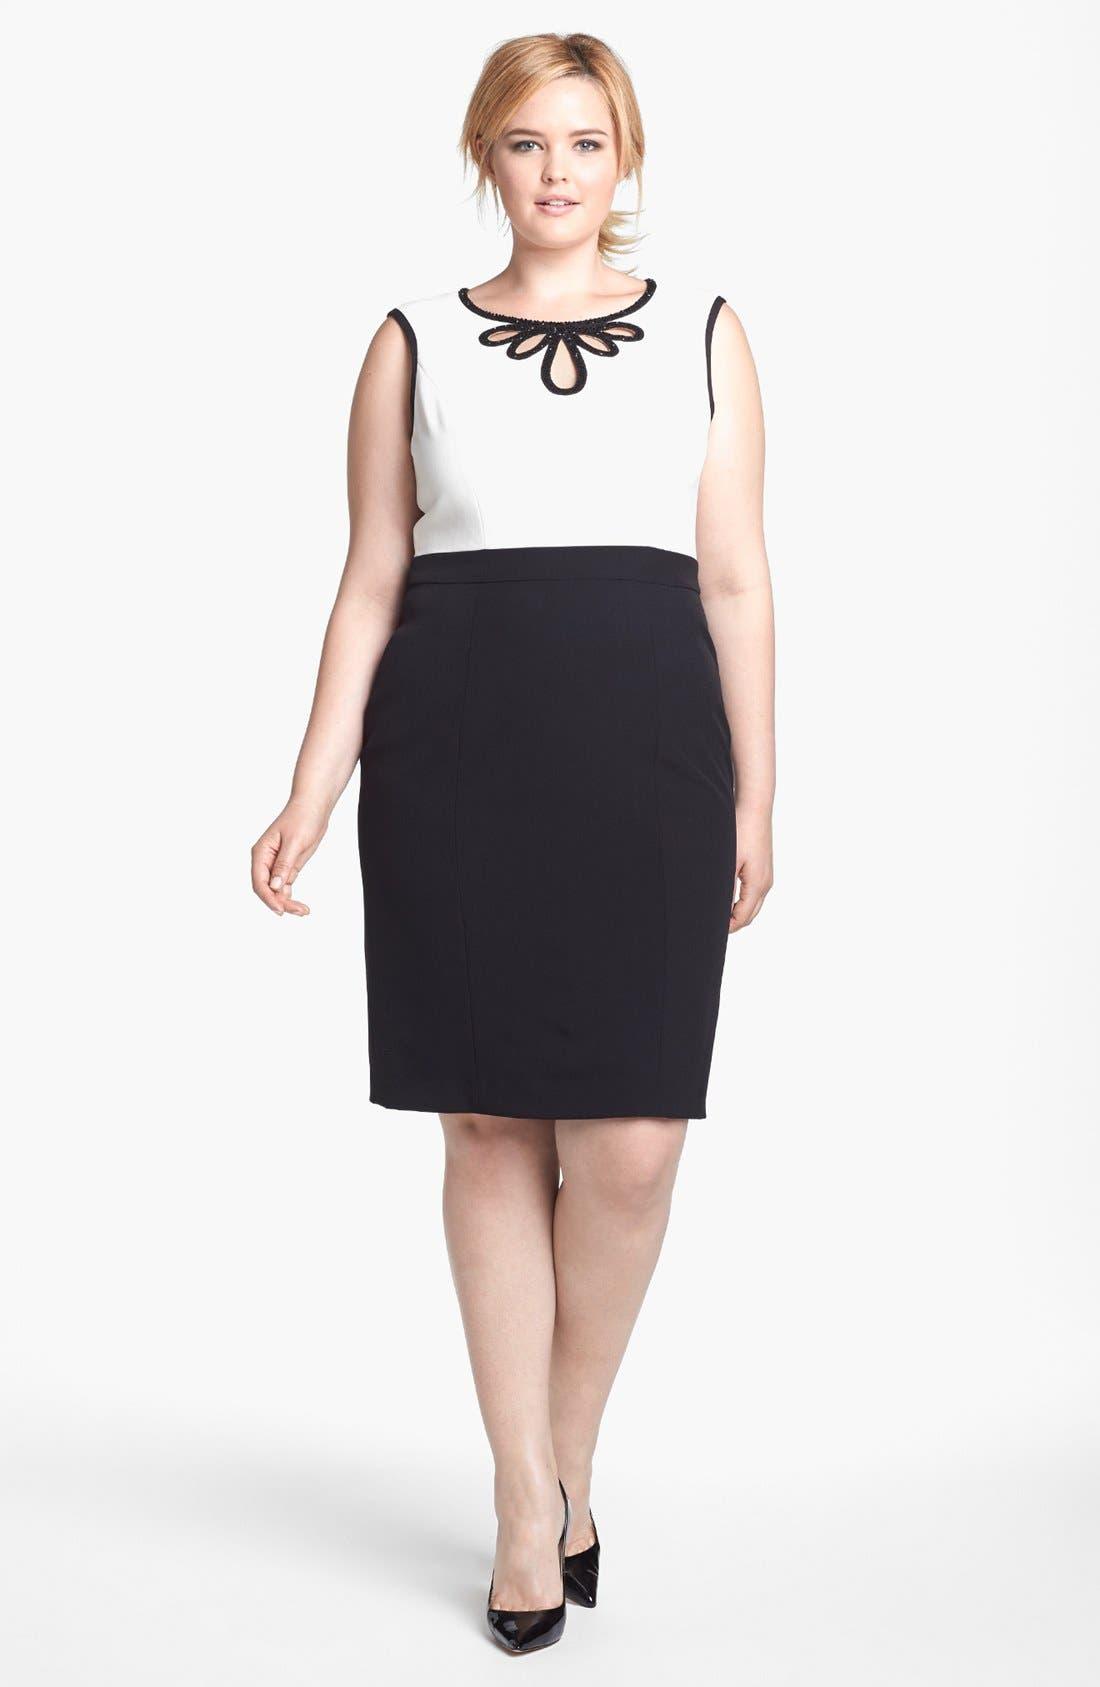 Alternate Image 1 Selected - Adrianna Papell Embellished Crepe Sheath Dress (Plus Size)